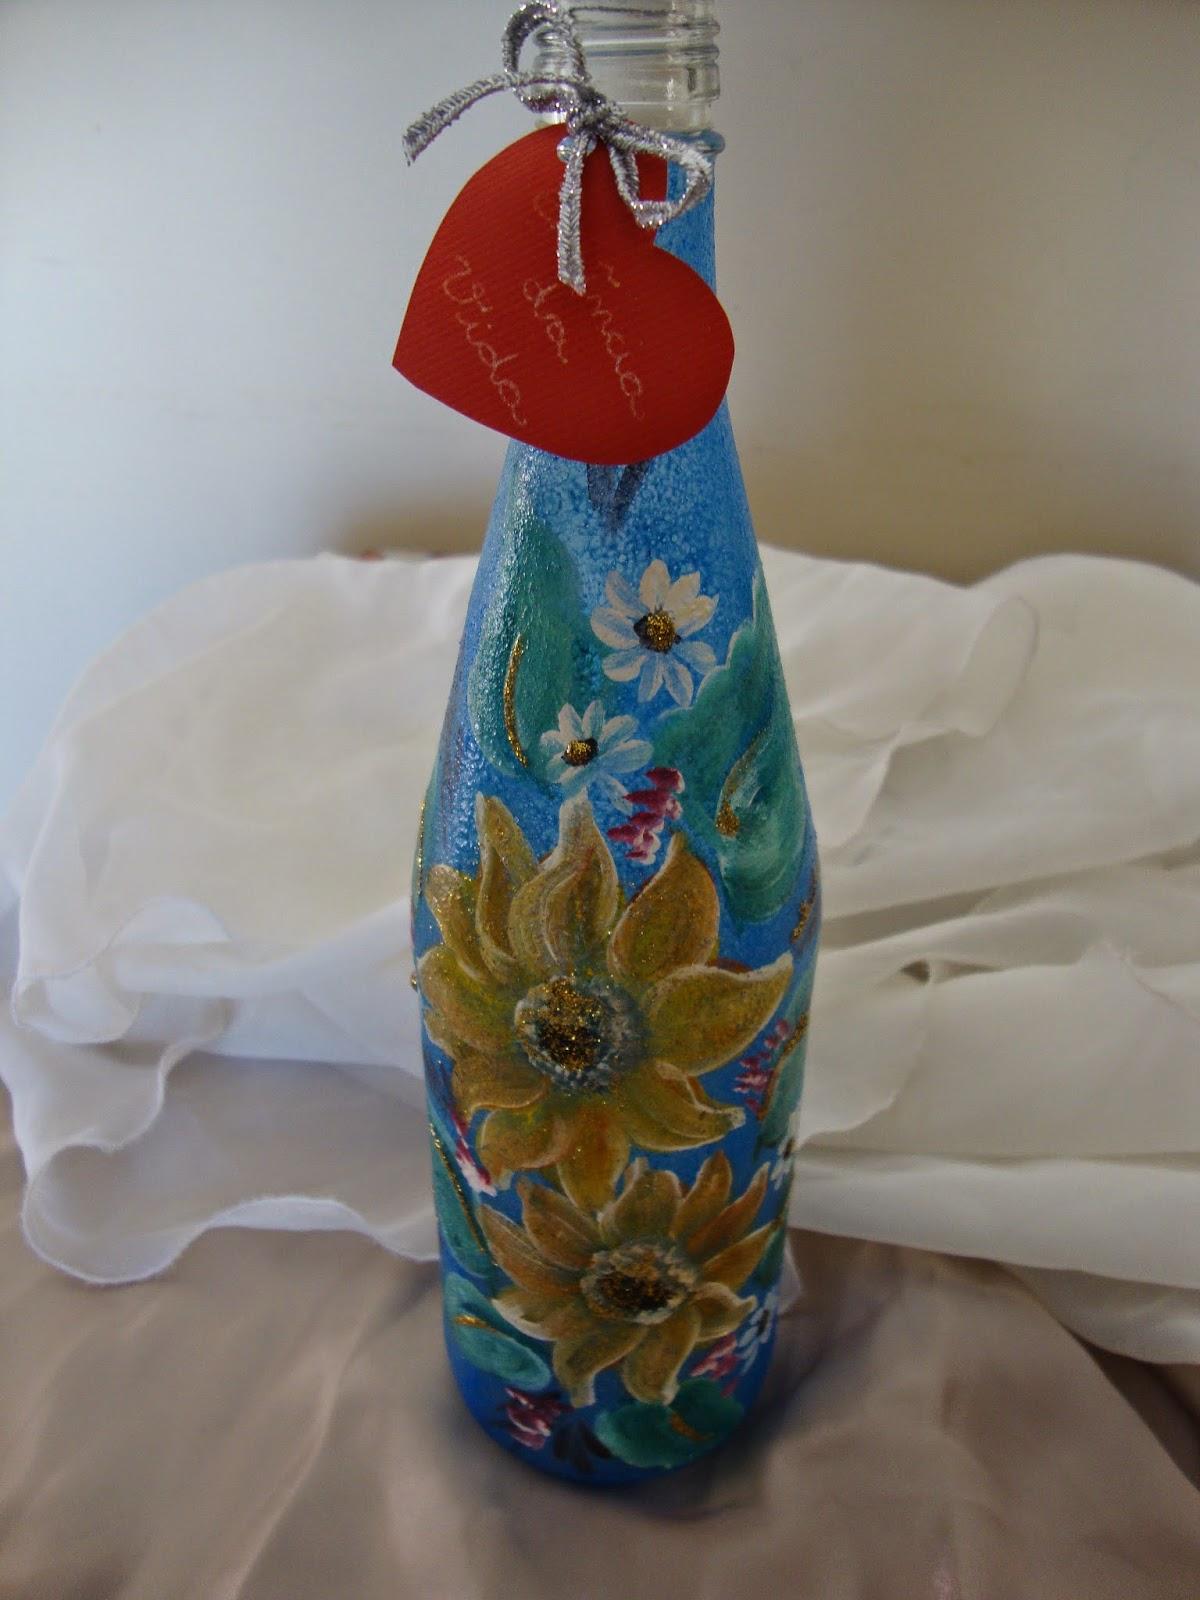 garrafa de vidro fosqueada com jateado colorido da Glitter e pintada